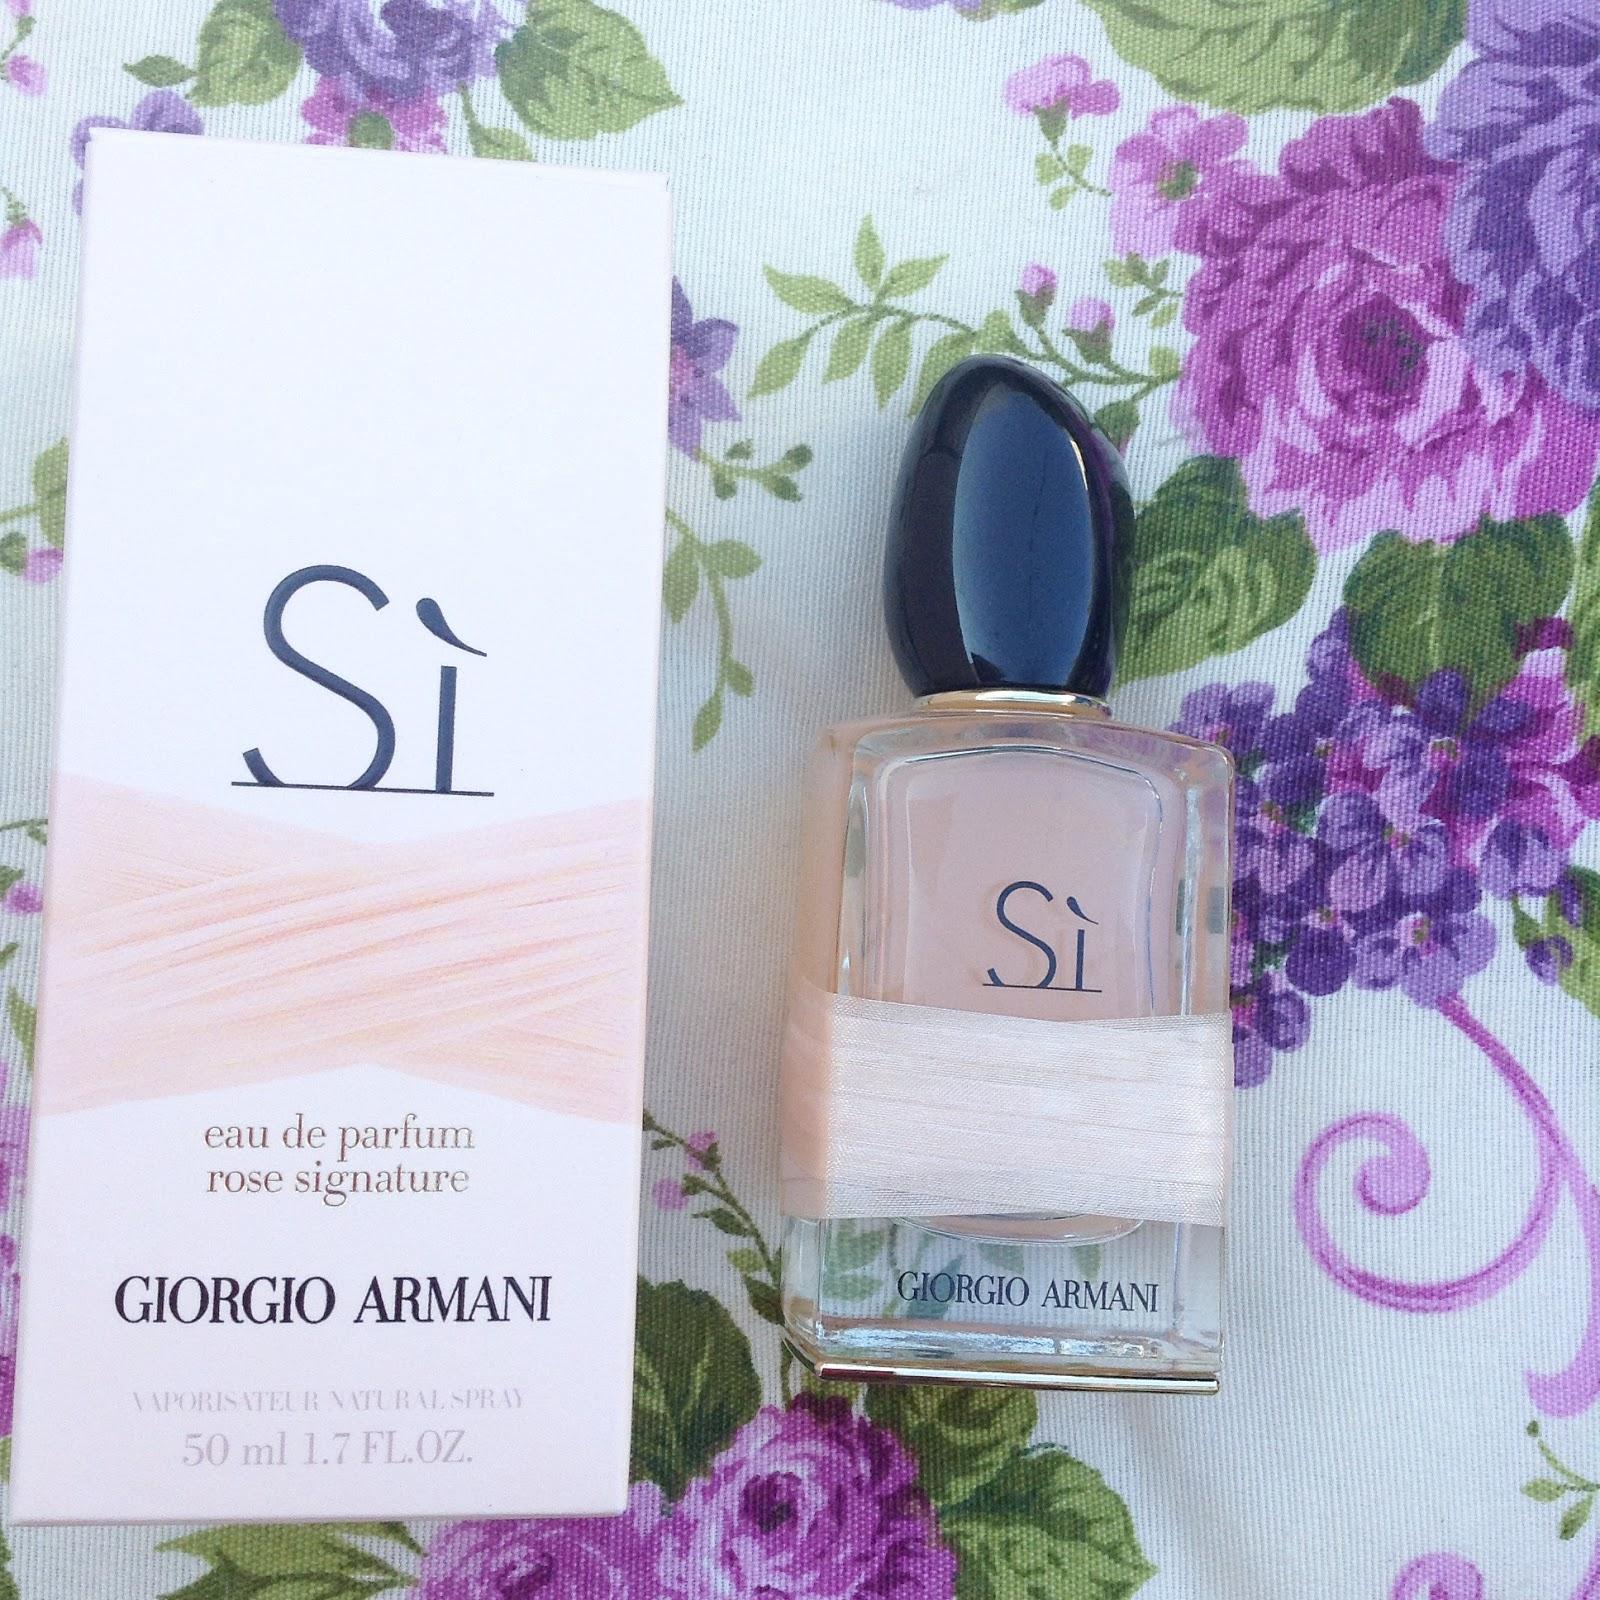 https://www.perfumestintin.com/si/55210011-giorgio-armani-si-rose-eau-de-parfum.html